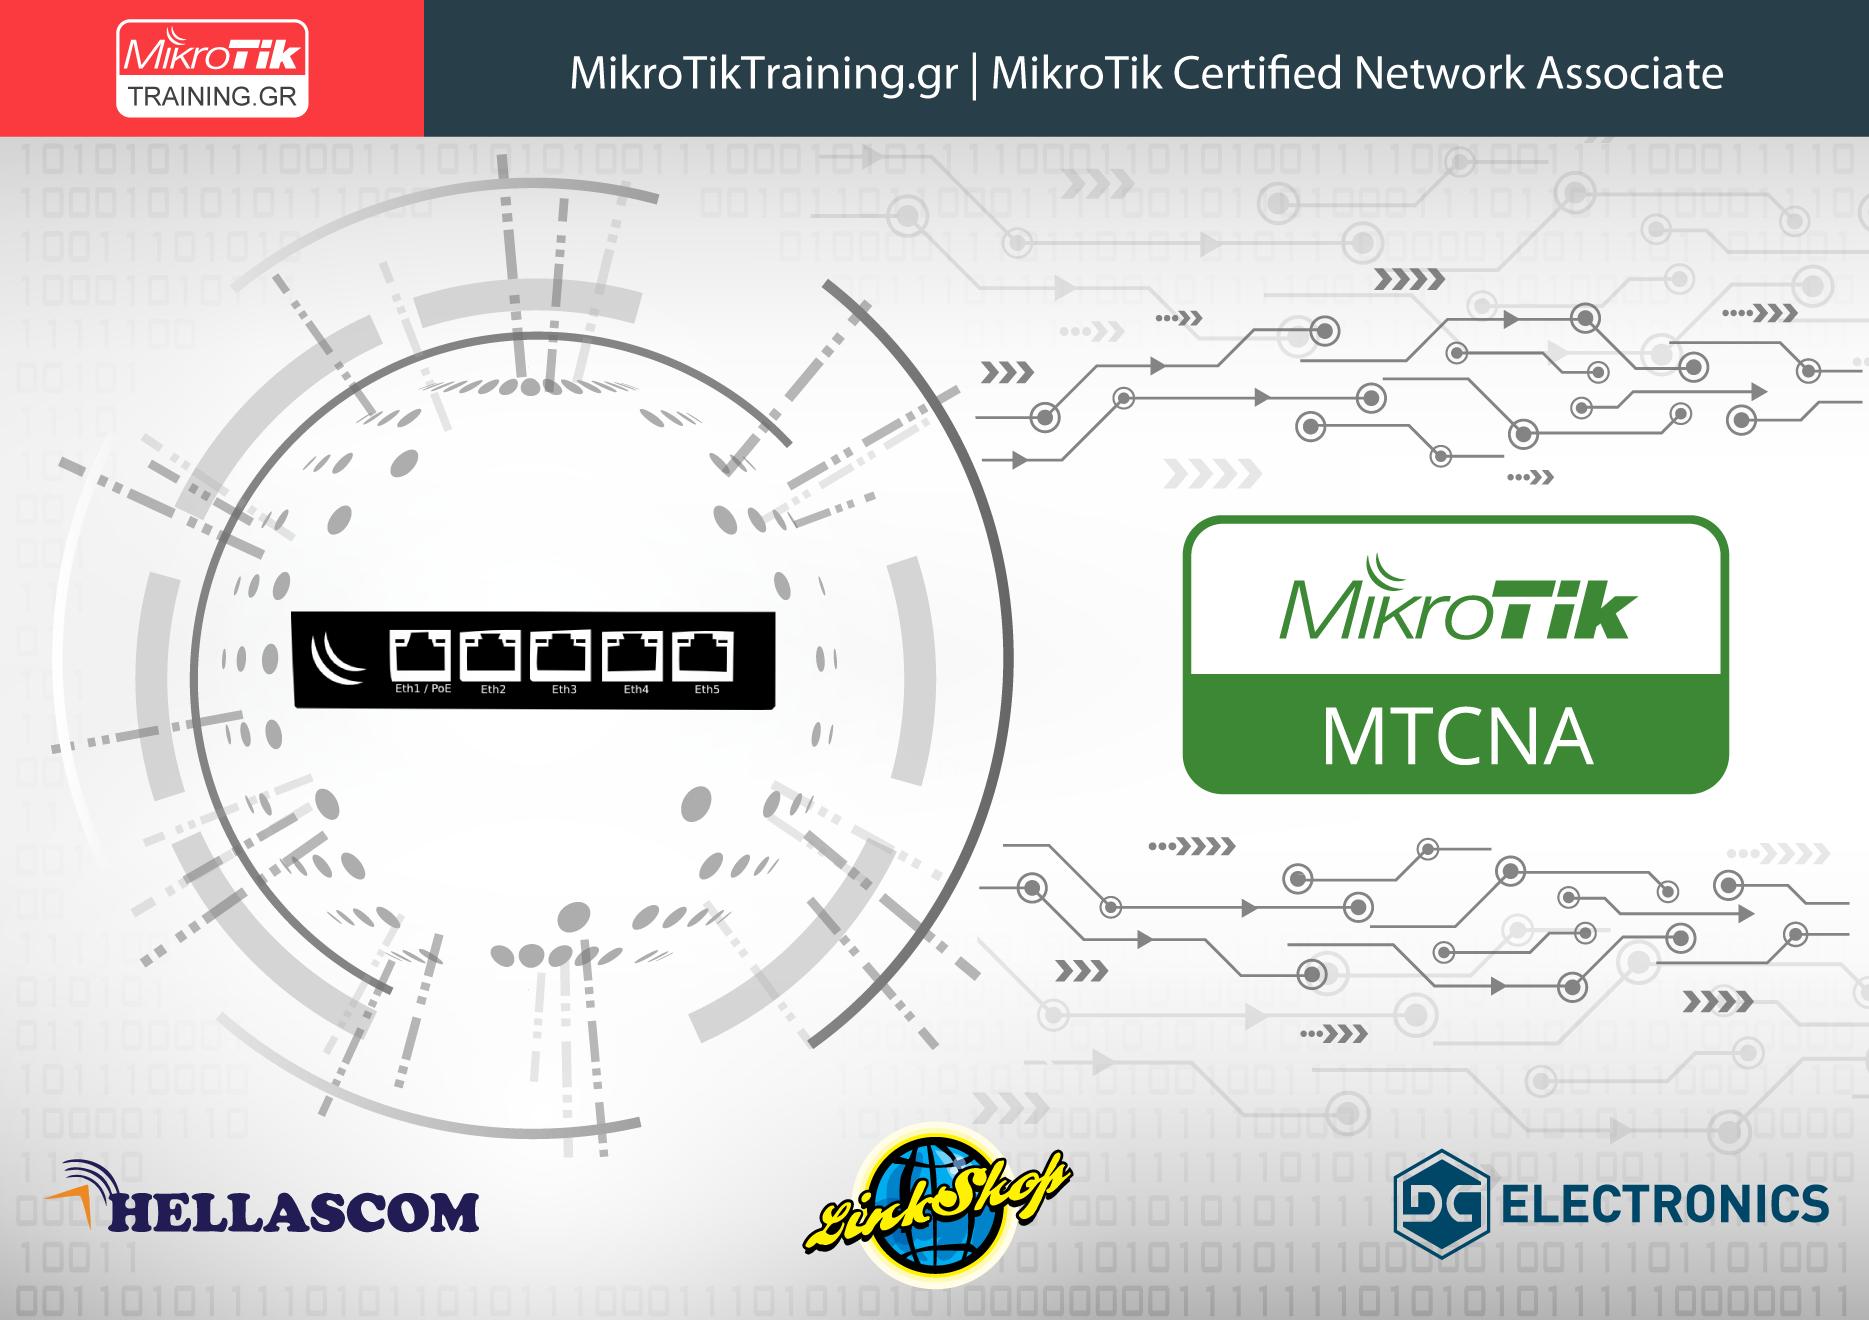 MTCNA – MikroTik Certified Network Associate (25 – 27 Σεπτεμβρίου 2020) Πειραιάς